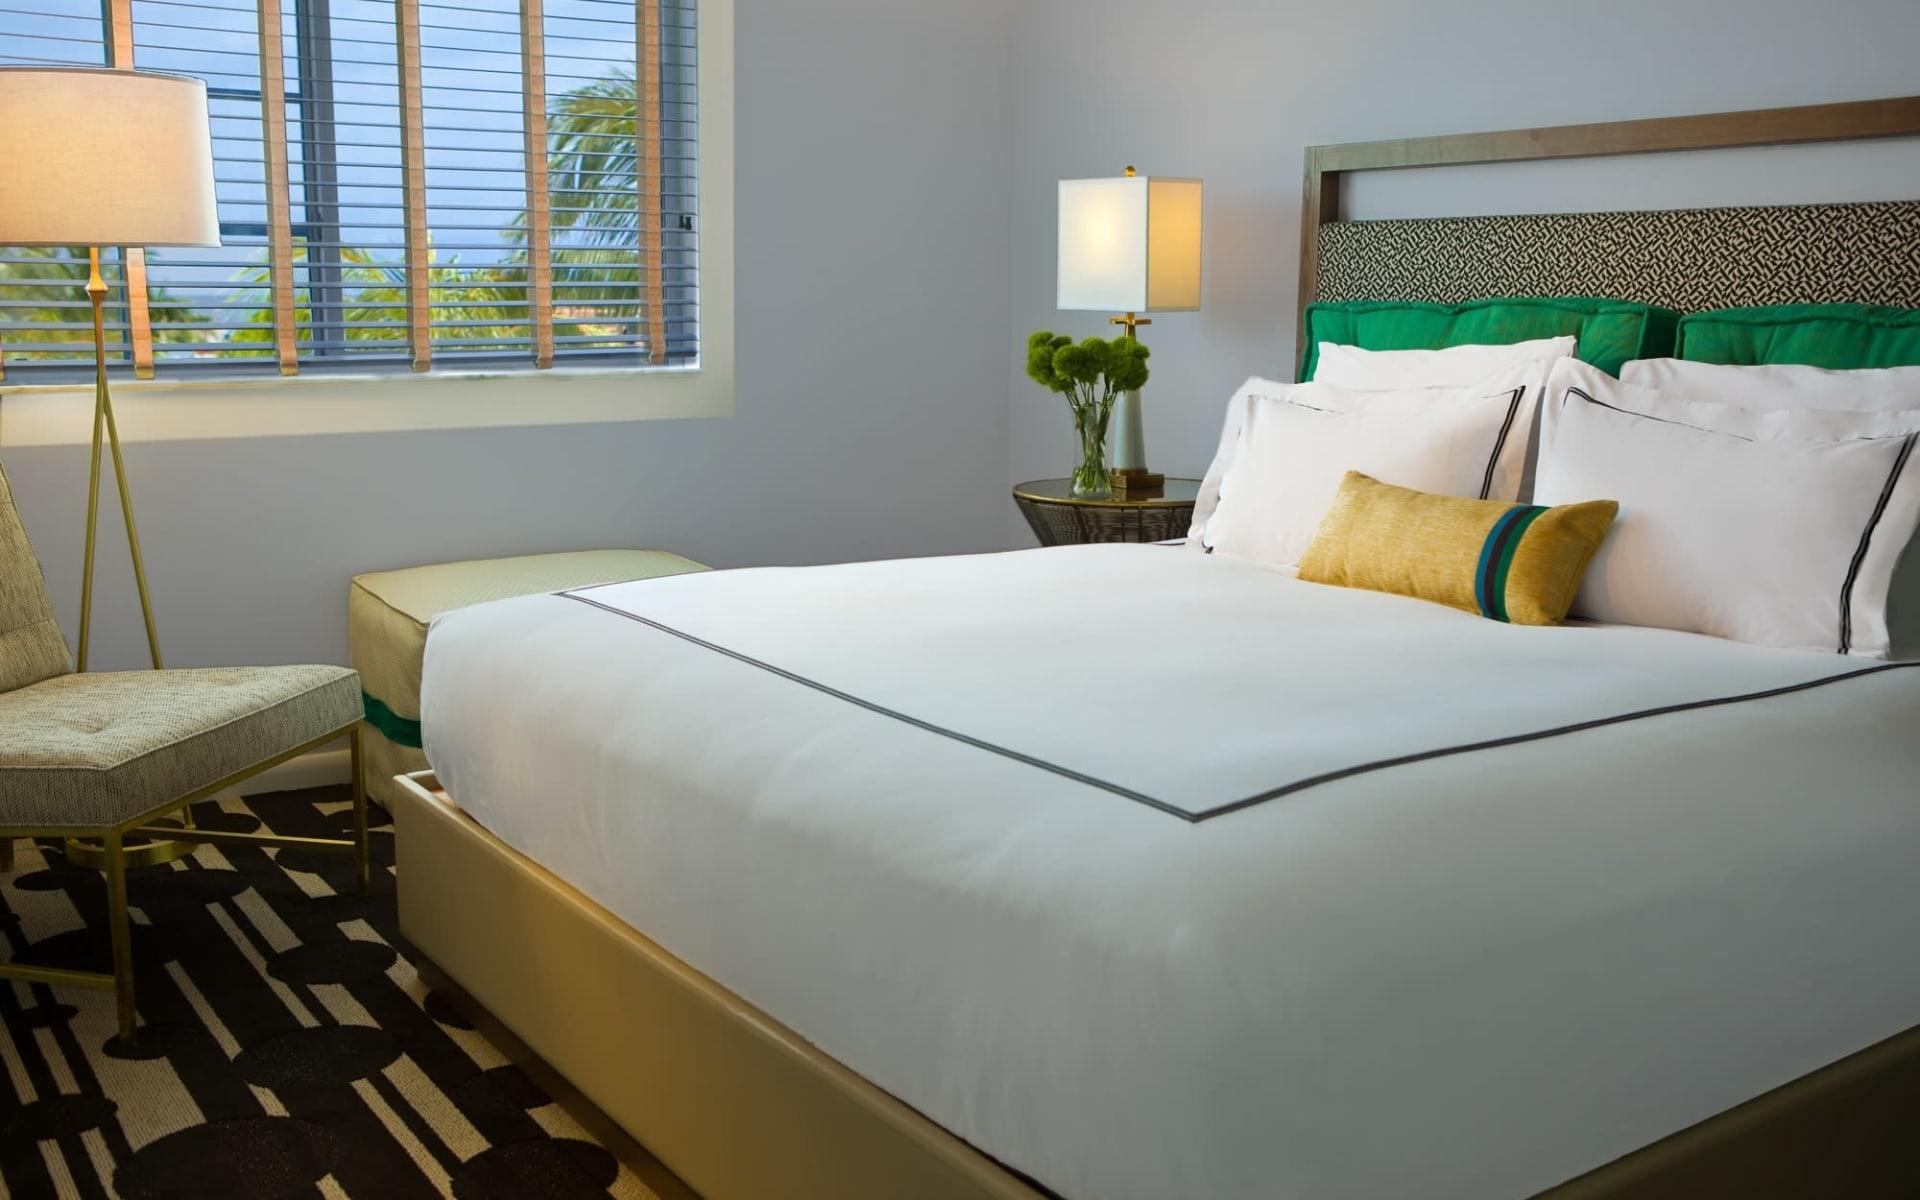 Kimpton Surfcomber Hotel in Miami Beach:  Surfcomber MIA -  Double